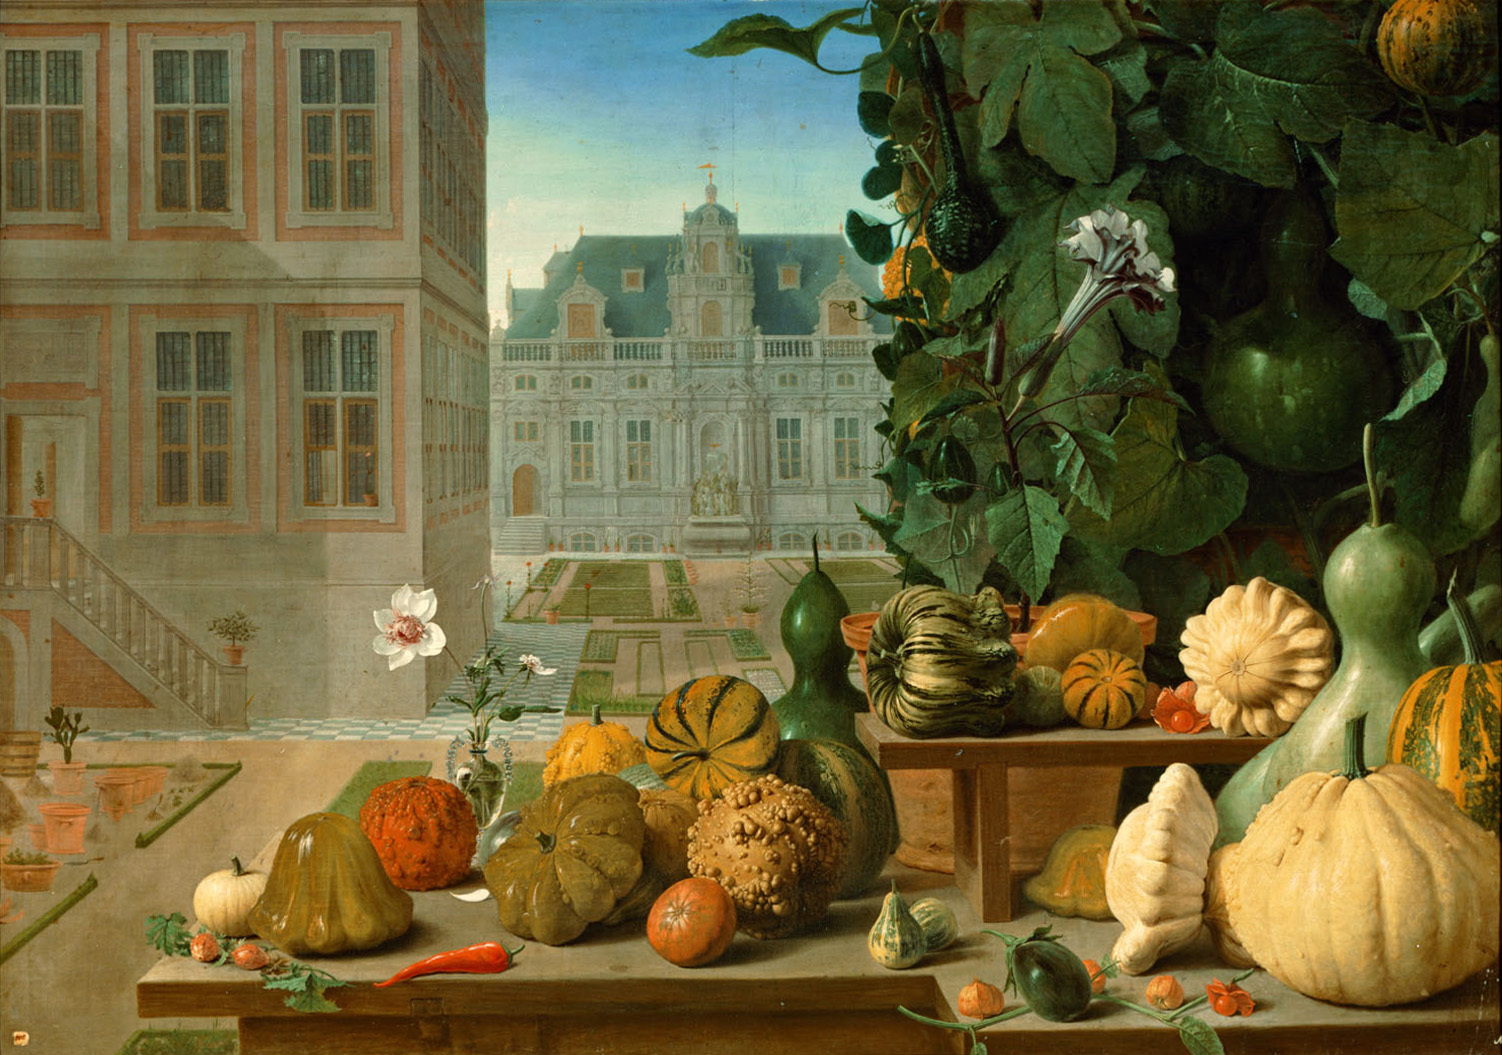 Jan_Anton_van_der_Baren_-_Still_Life_with_Pumpkins.jpg